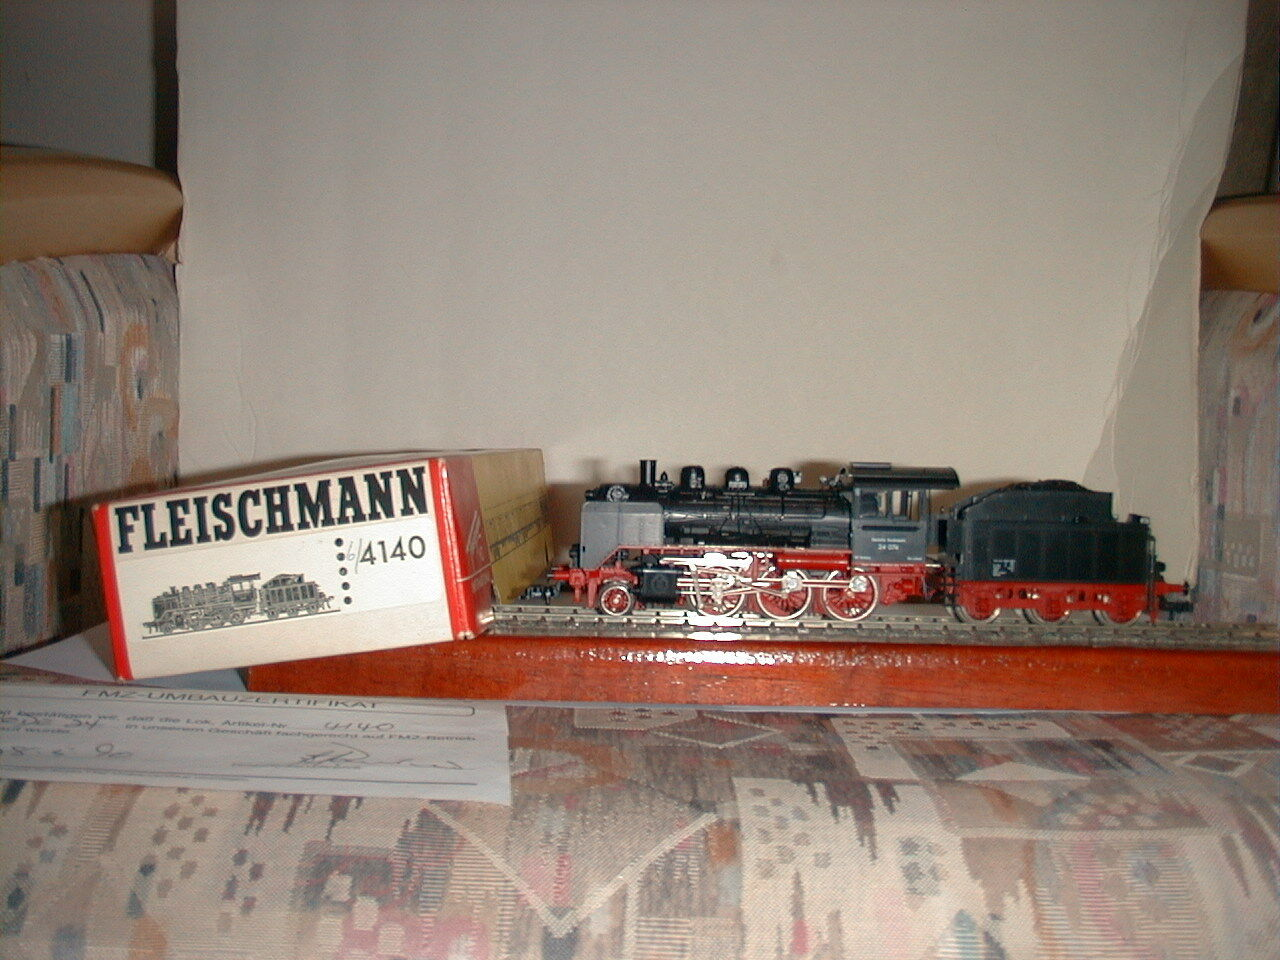 Fleischmann nr 6 4140 FMZ 2 -6 -0 Blandad trafik Wagner Deflektorer.Kod 024